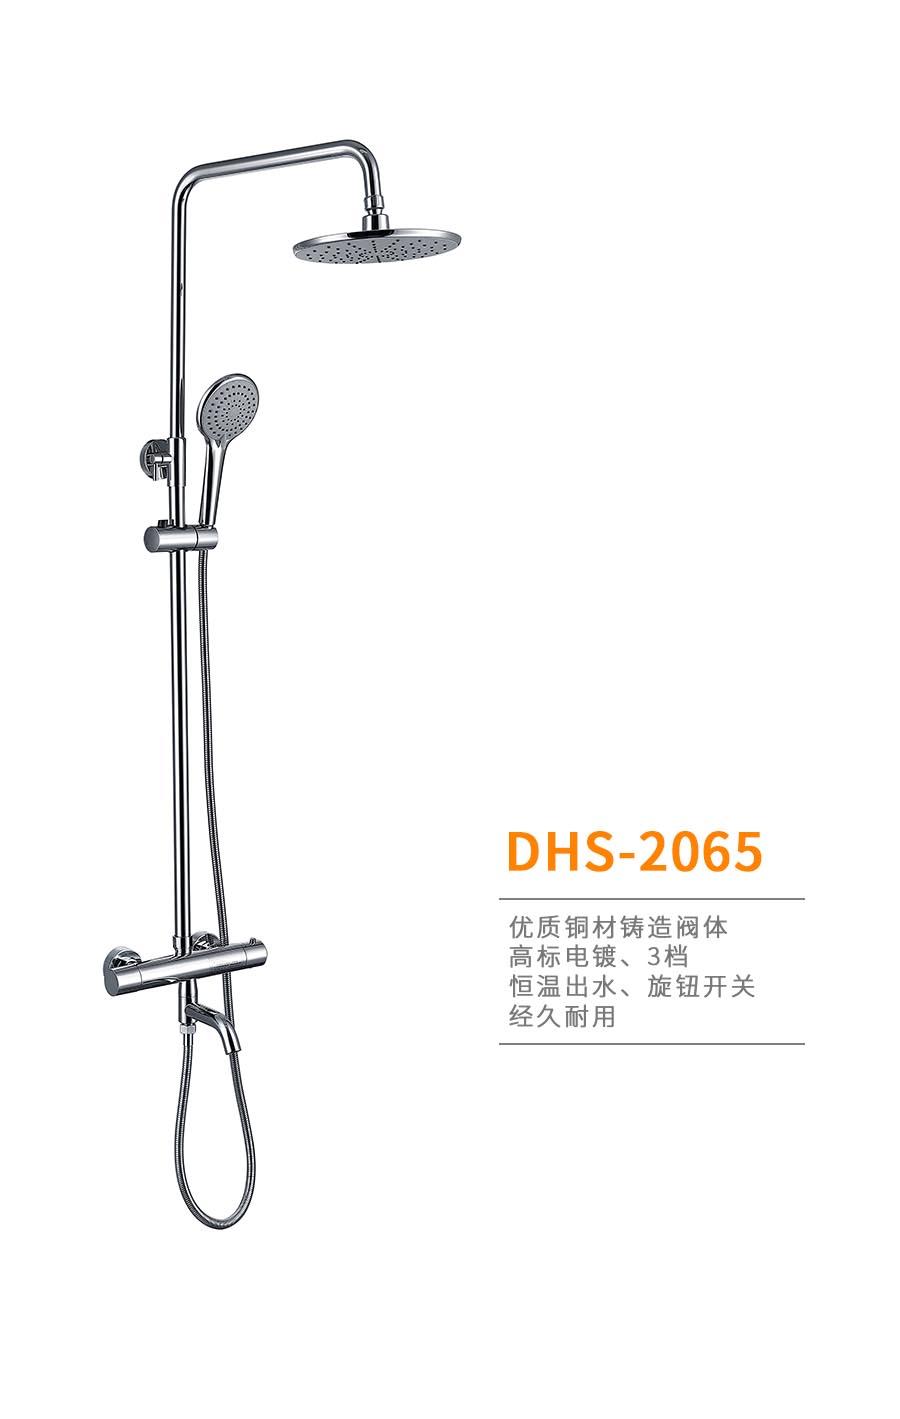 dhs-2065b.jpg